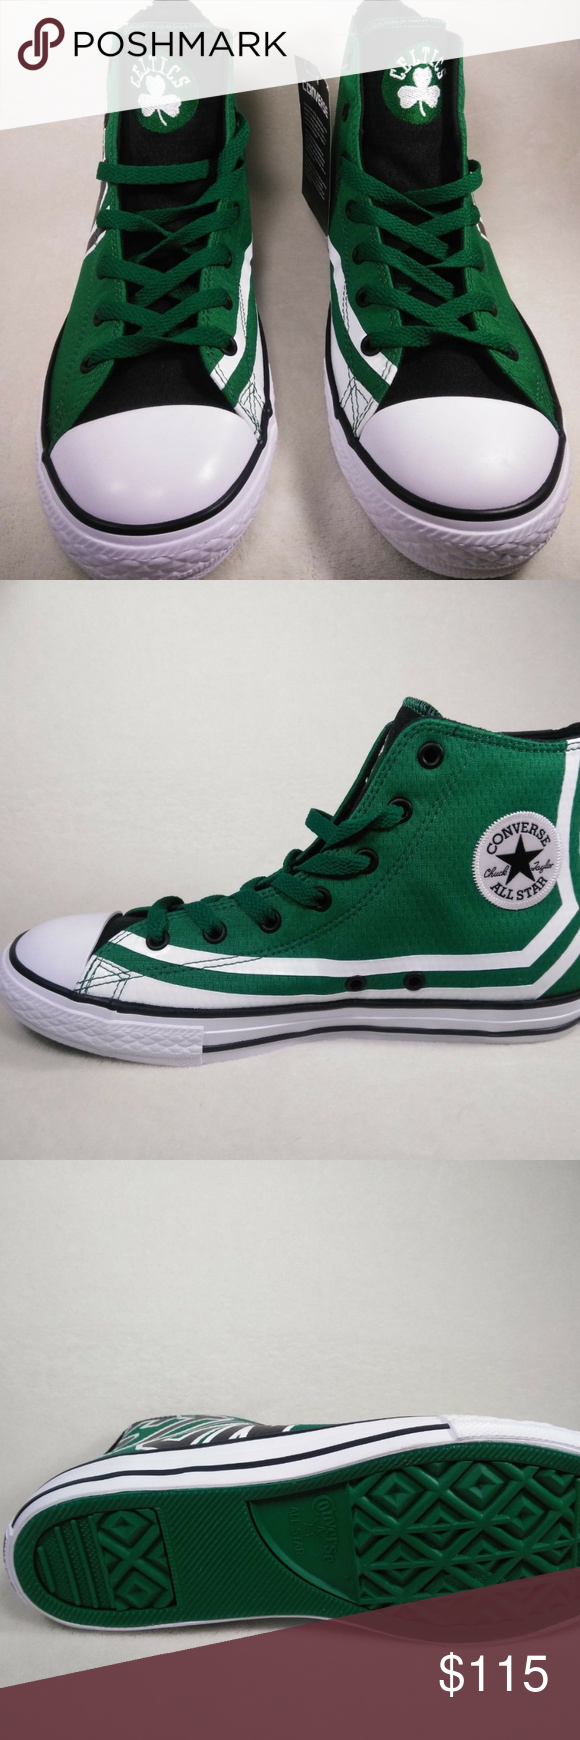 Limited Edition Boston Celtics NBA Converse All St